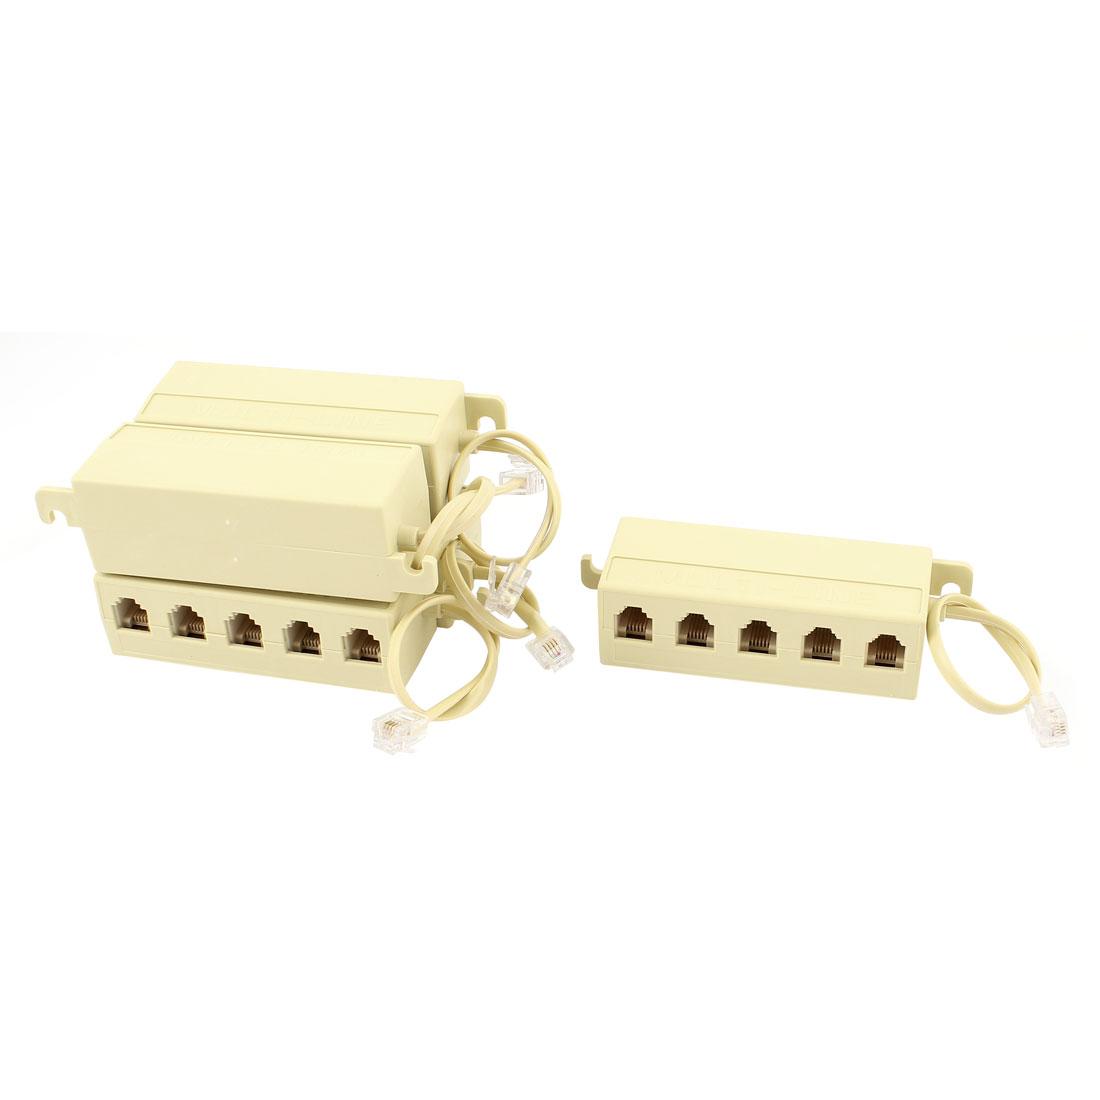 5 Pcs 5 Way Outlet 6P4C RJ11 Telephone Modular Jack Line Splitter Adapter Beige